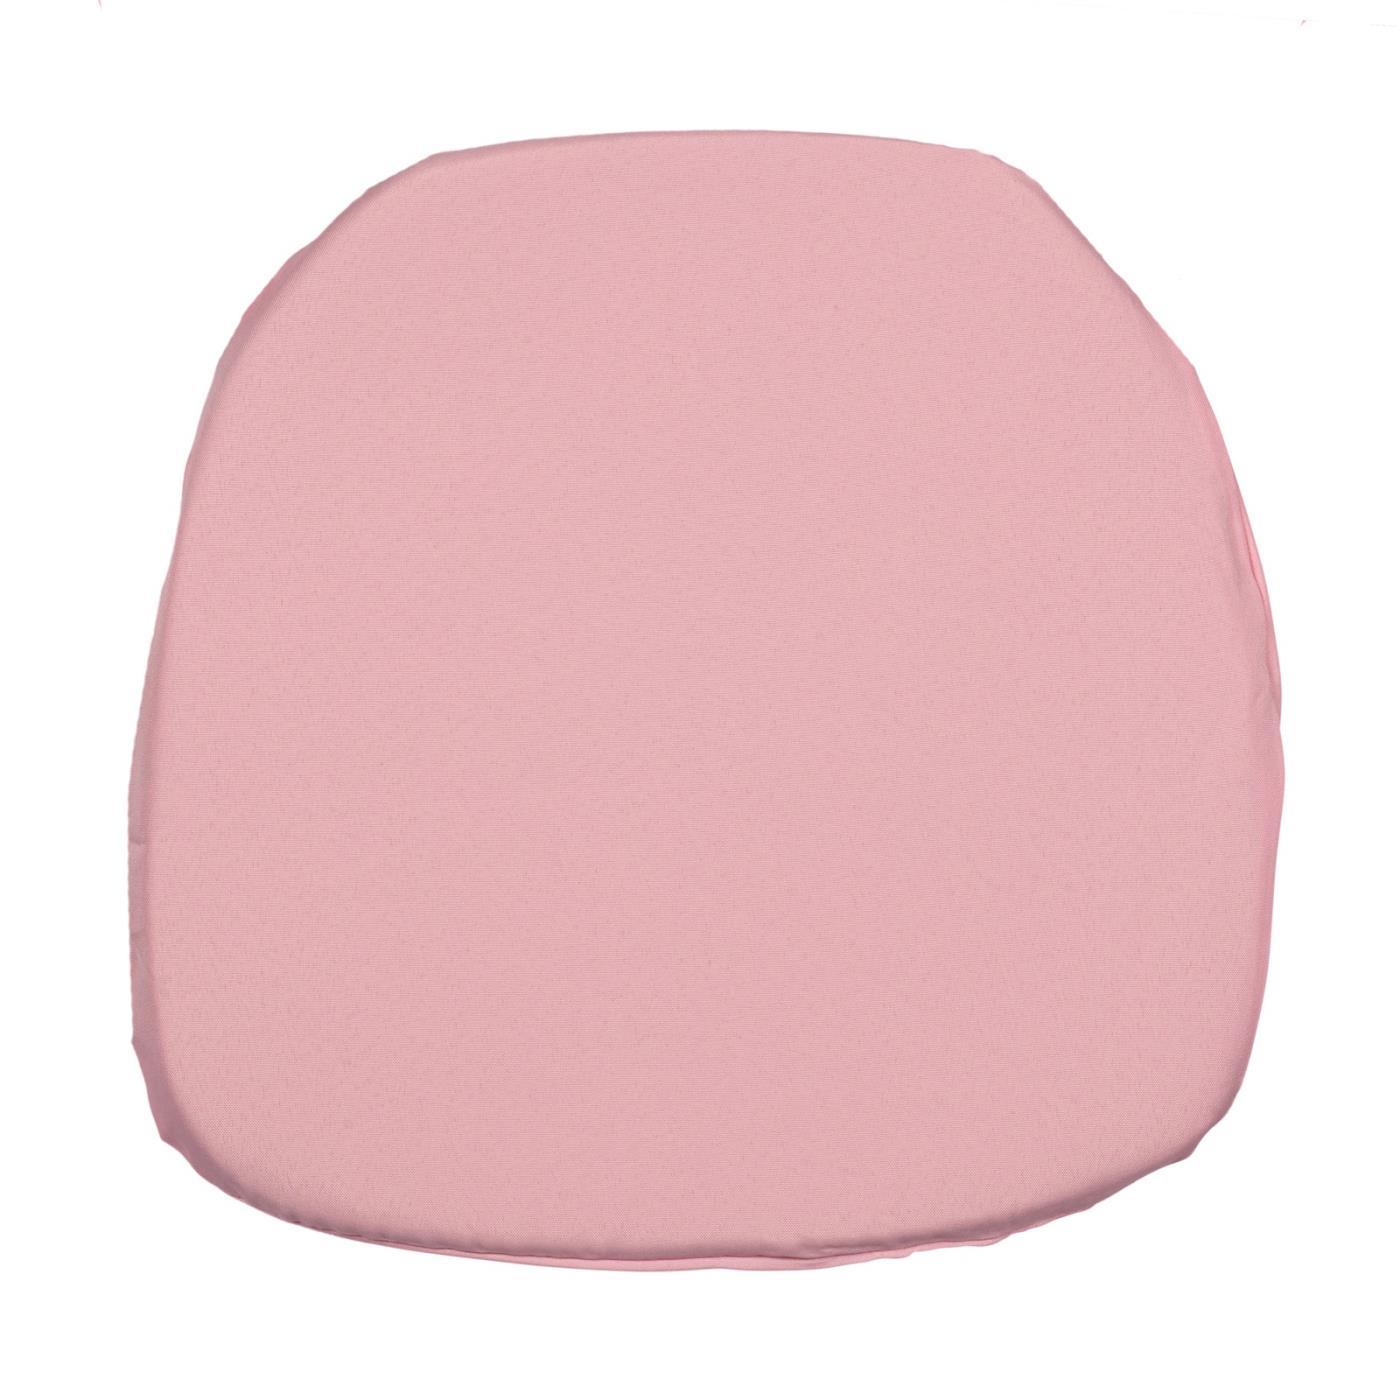 Poly Seat Cushion - Light Pink